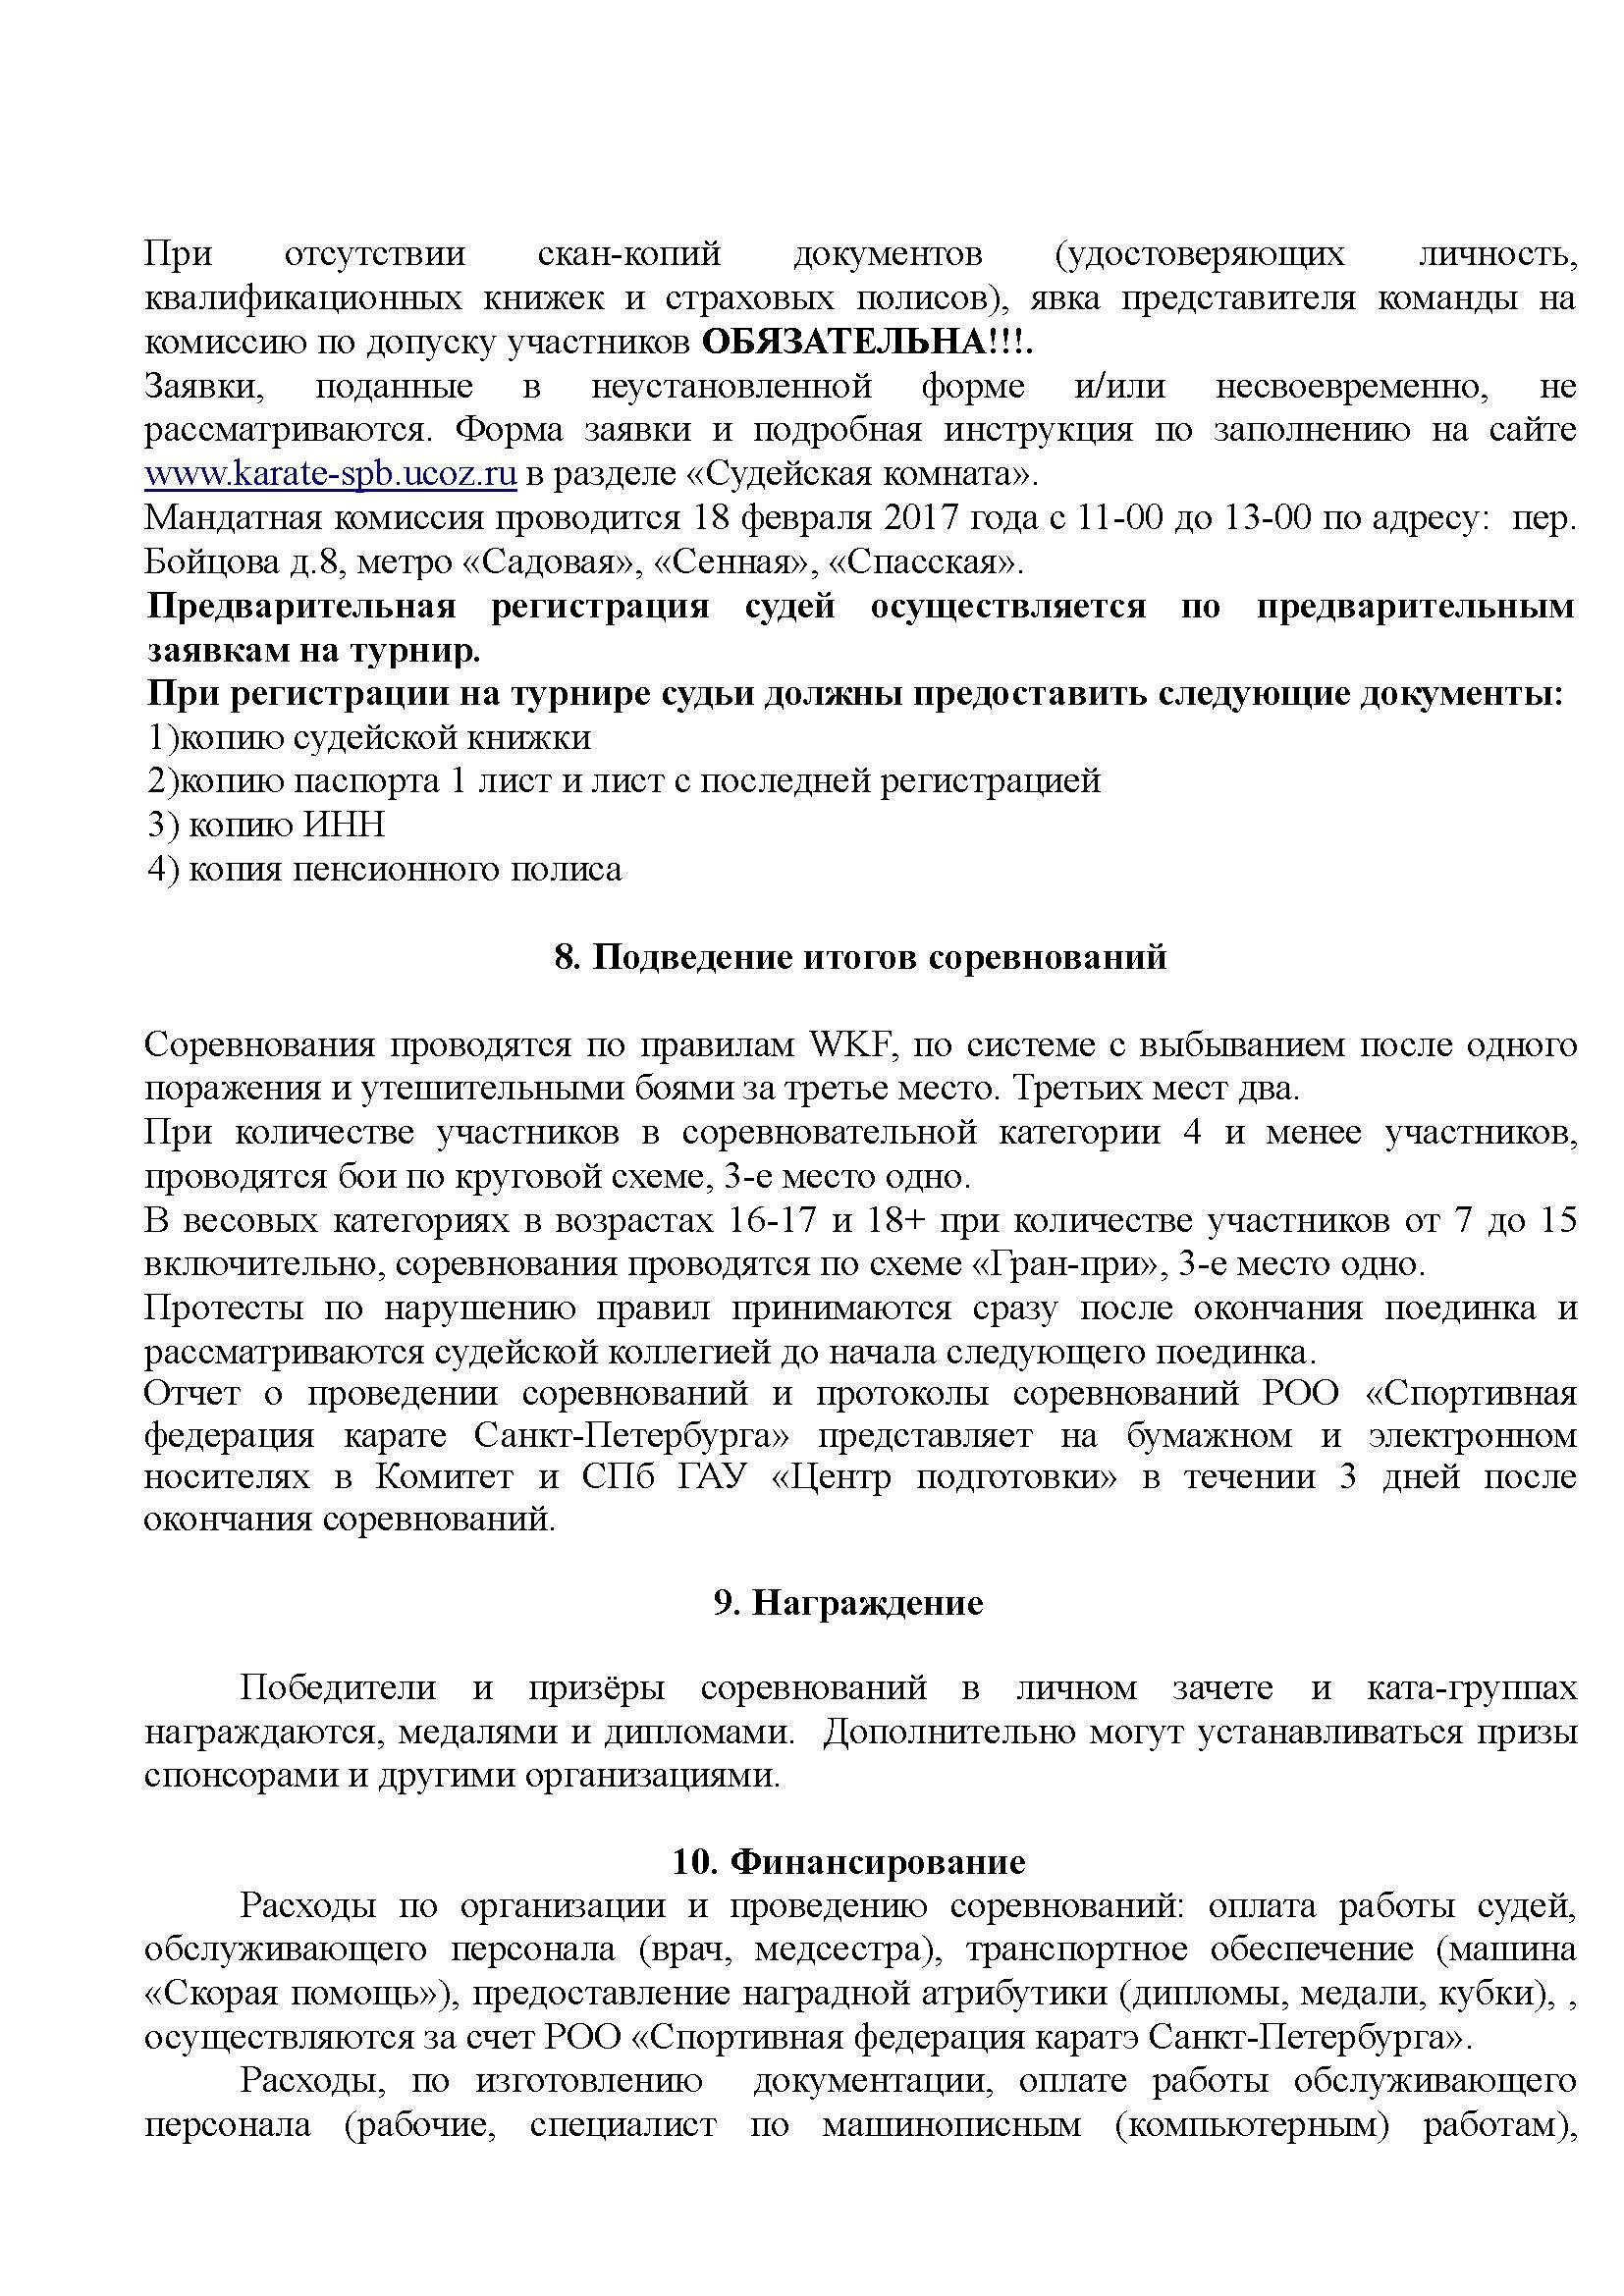 PS-2017-001-ВС_Страница_5